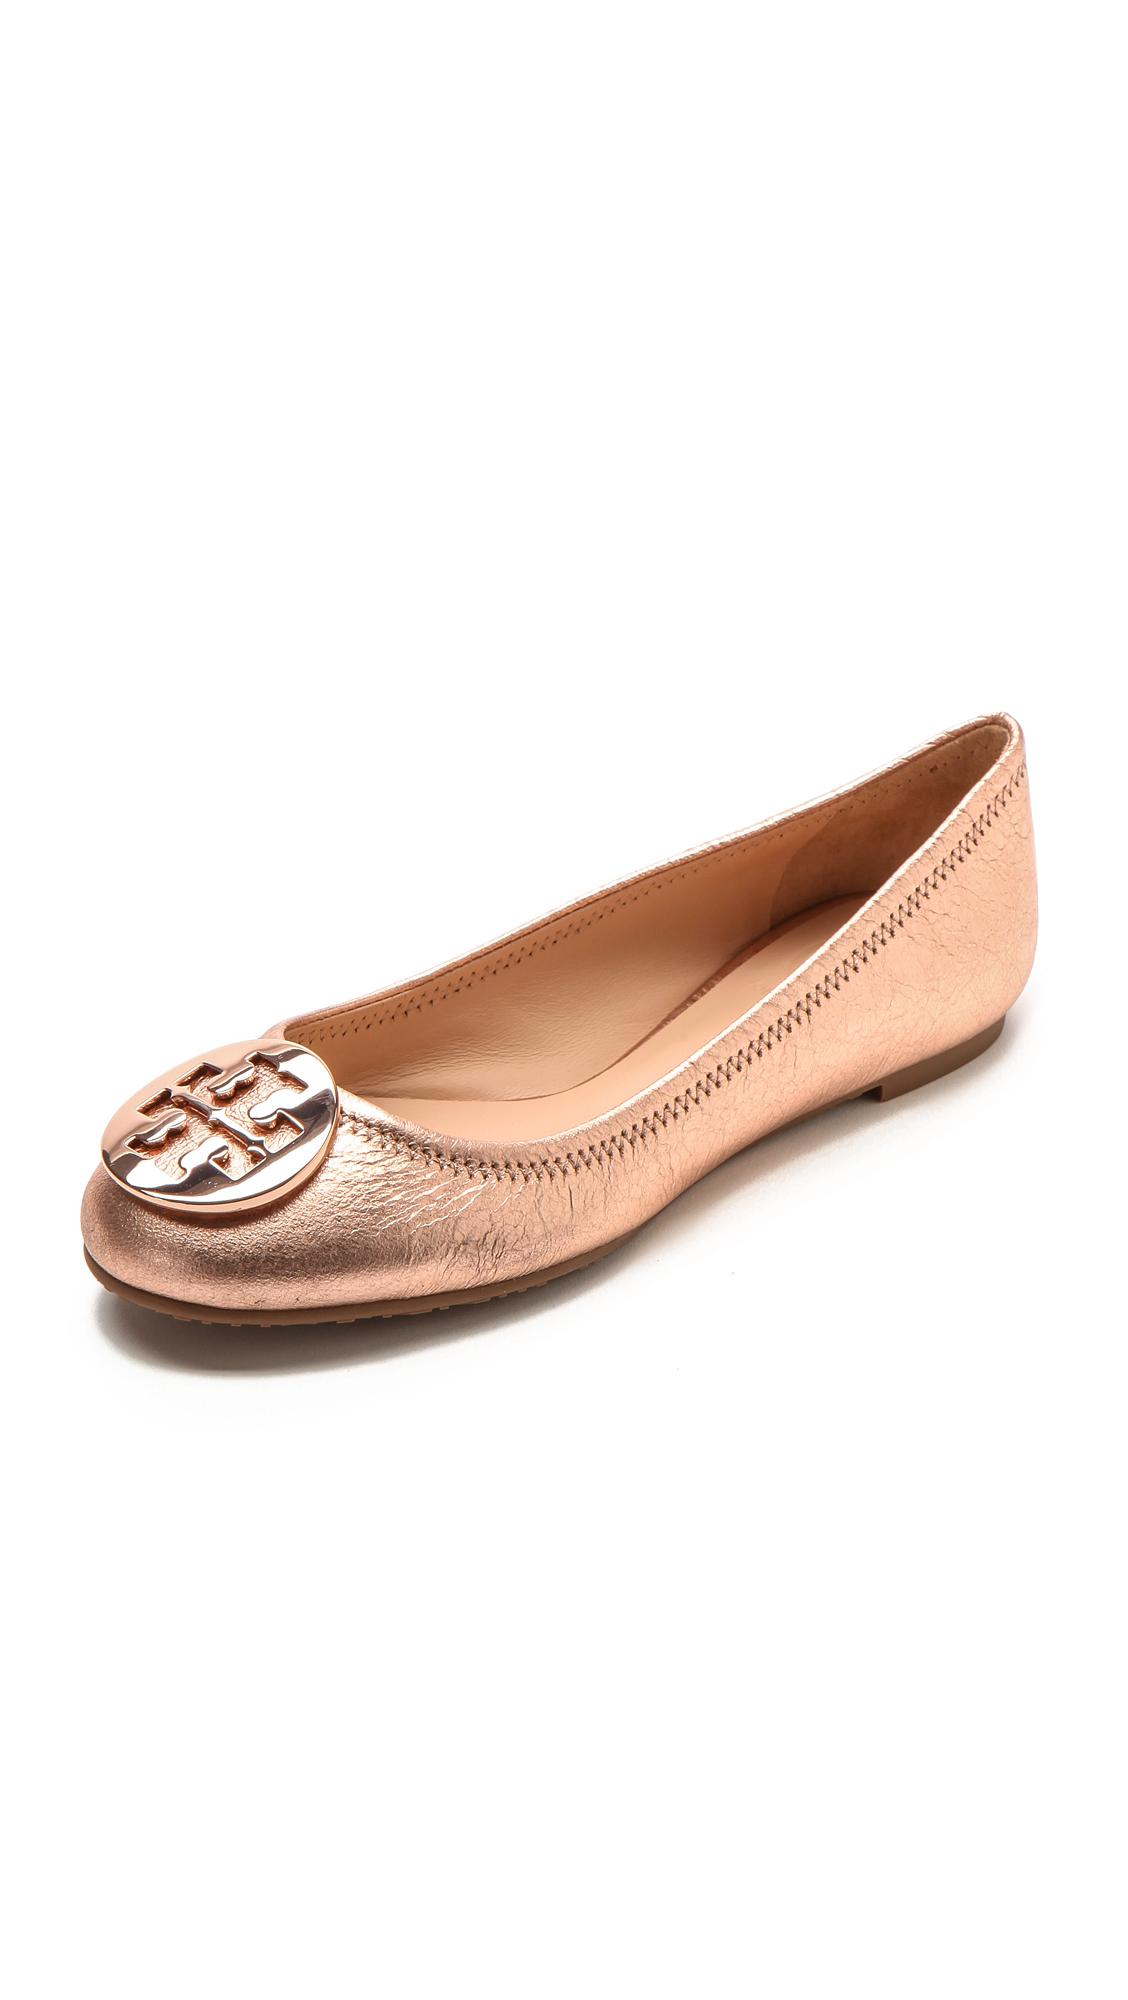 ec0f72cf8 ... hot lyst tory burch reva ballet flats rose gold in pink 19f00 aa805